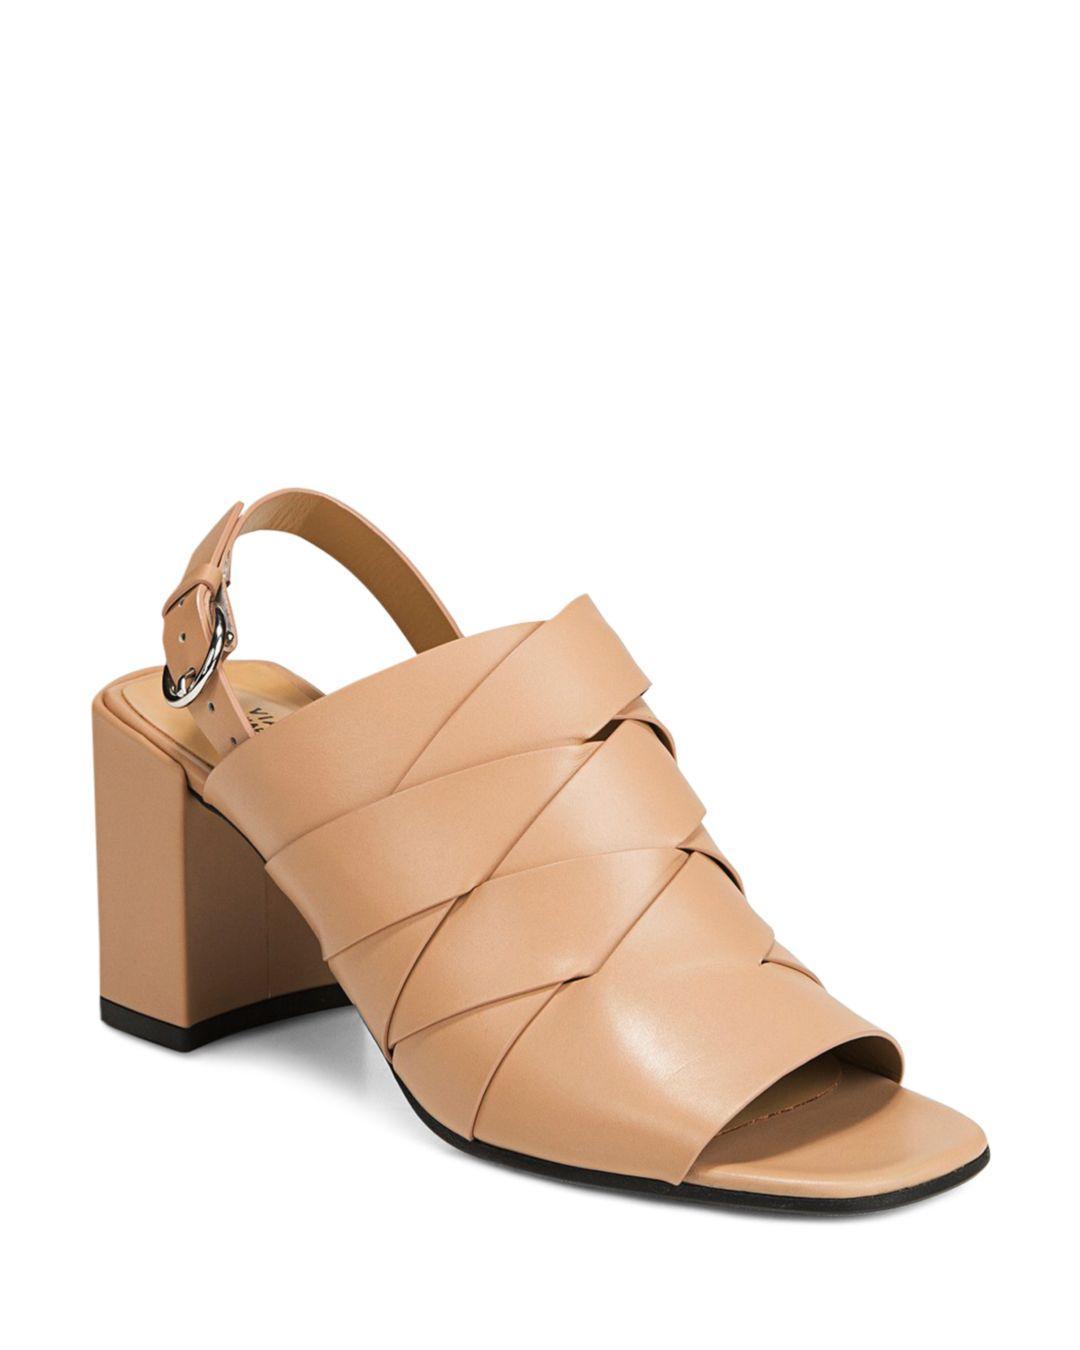 ad35f457f37a Lyst - Via Spiga Women s Oren 2 Woven Leather Slingback Sandals